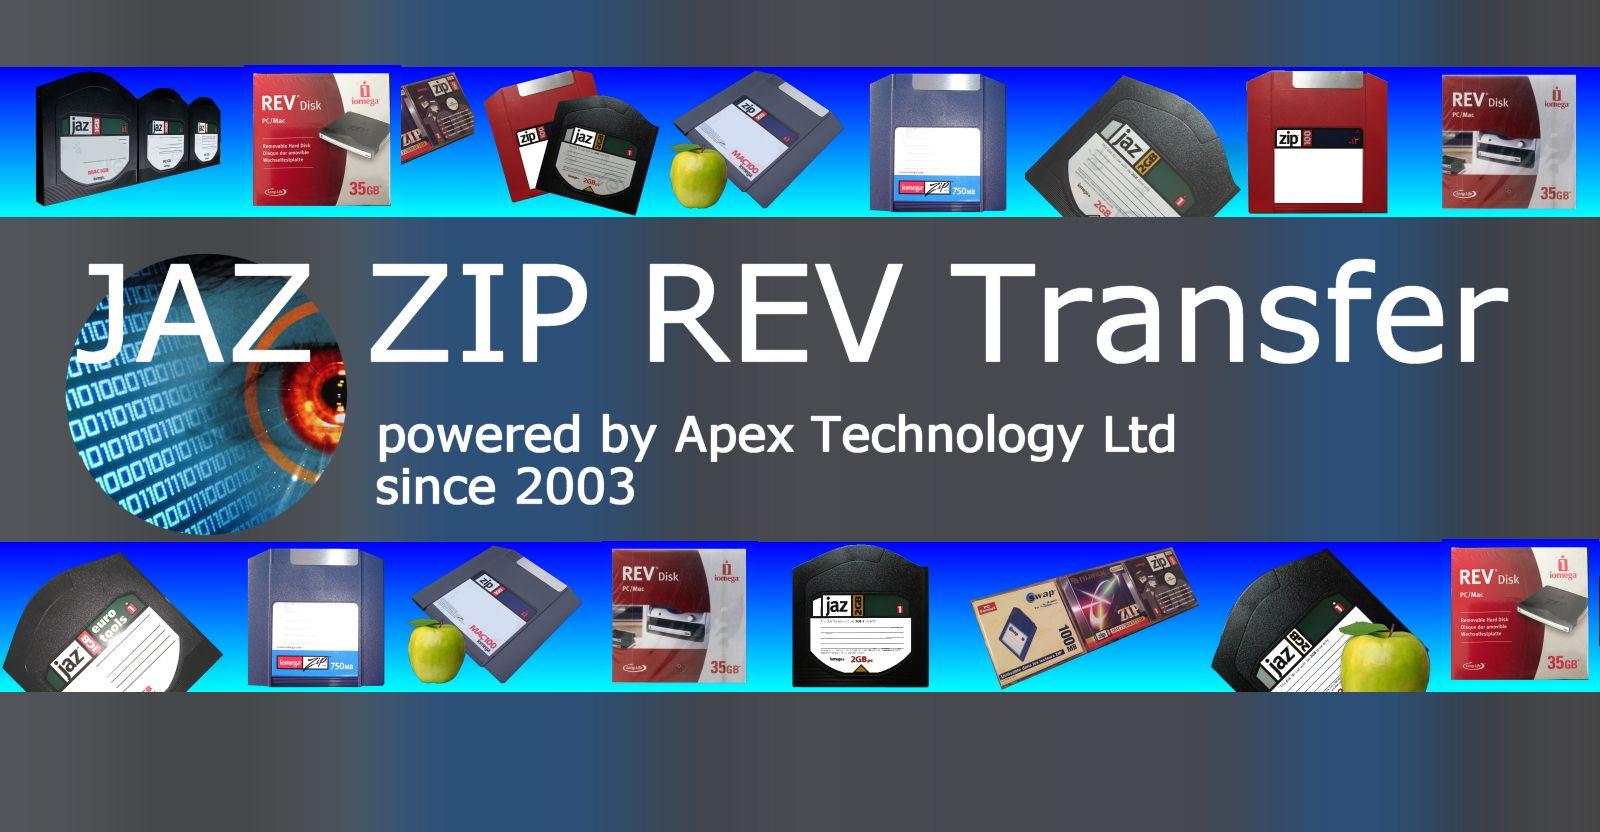 Jaz Rev and Zip disk conversions